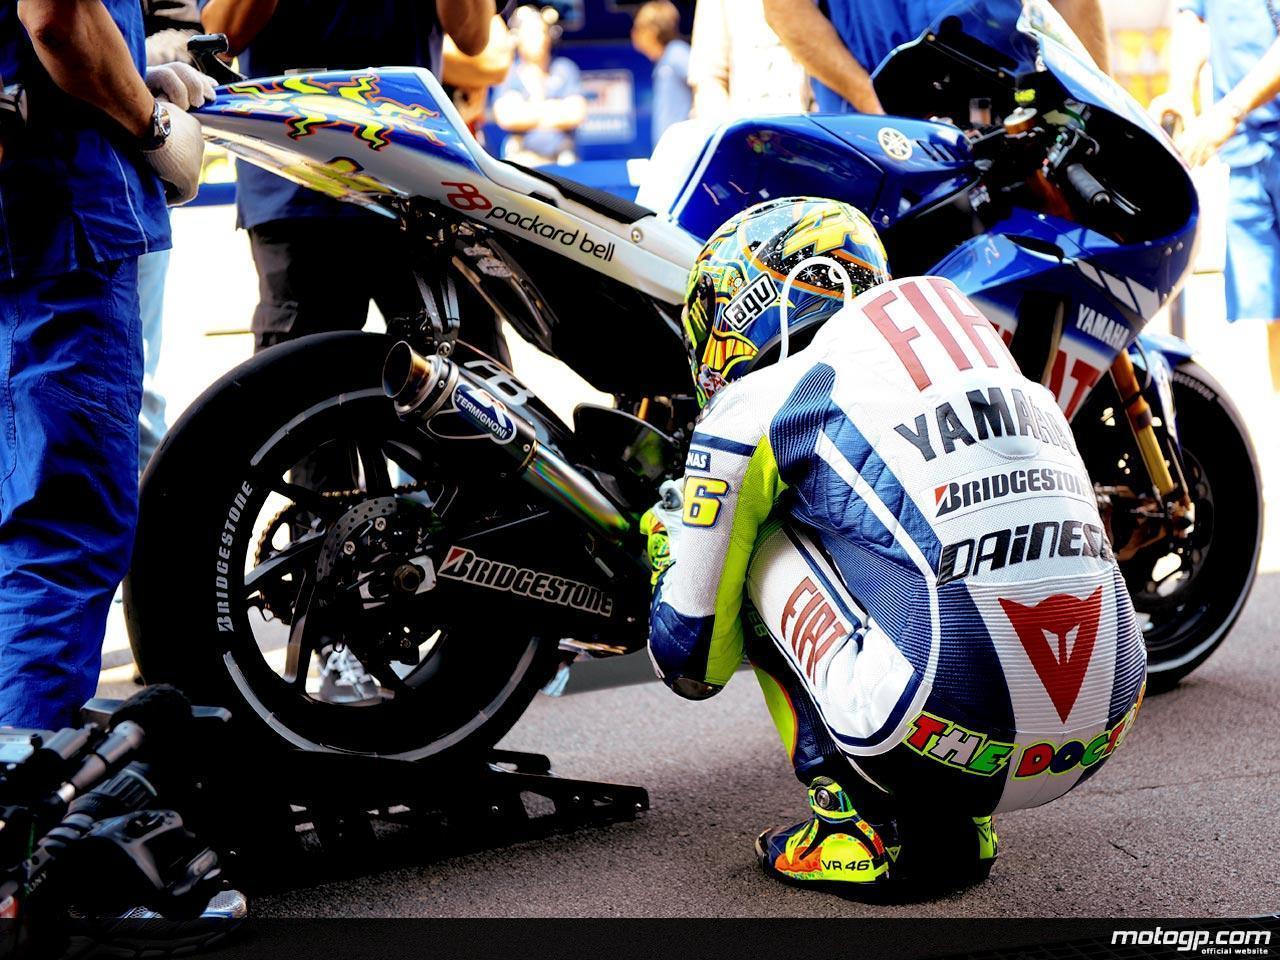 Valentino Rossi Motor Wallpaper 1280x960